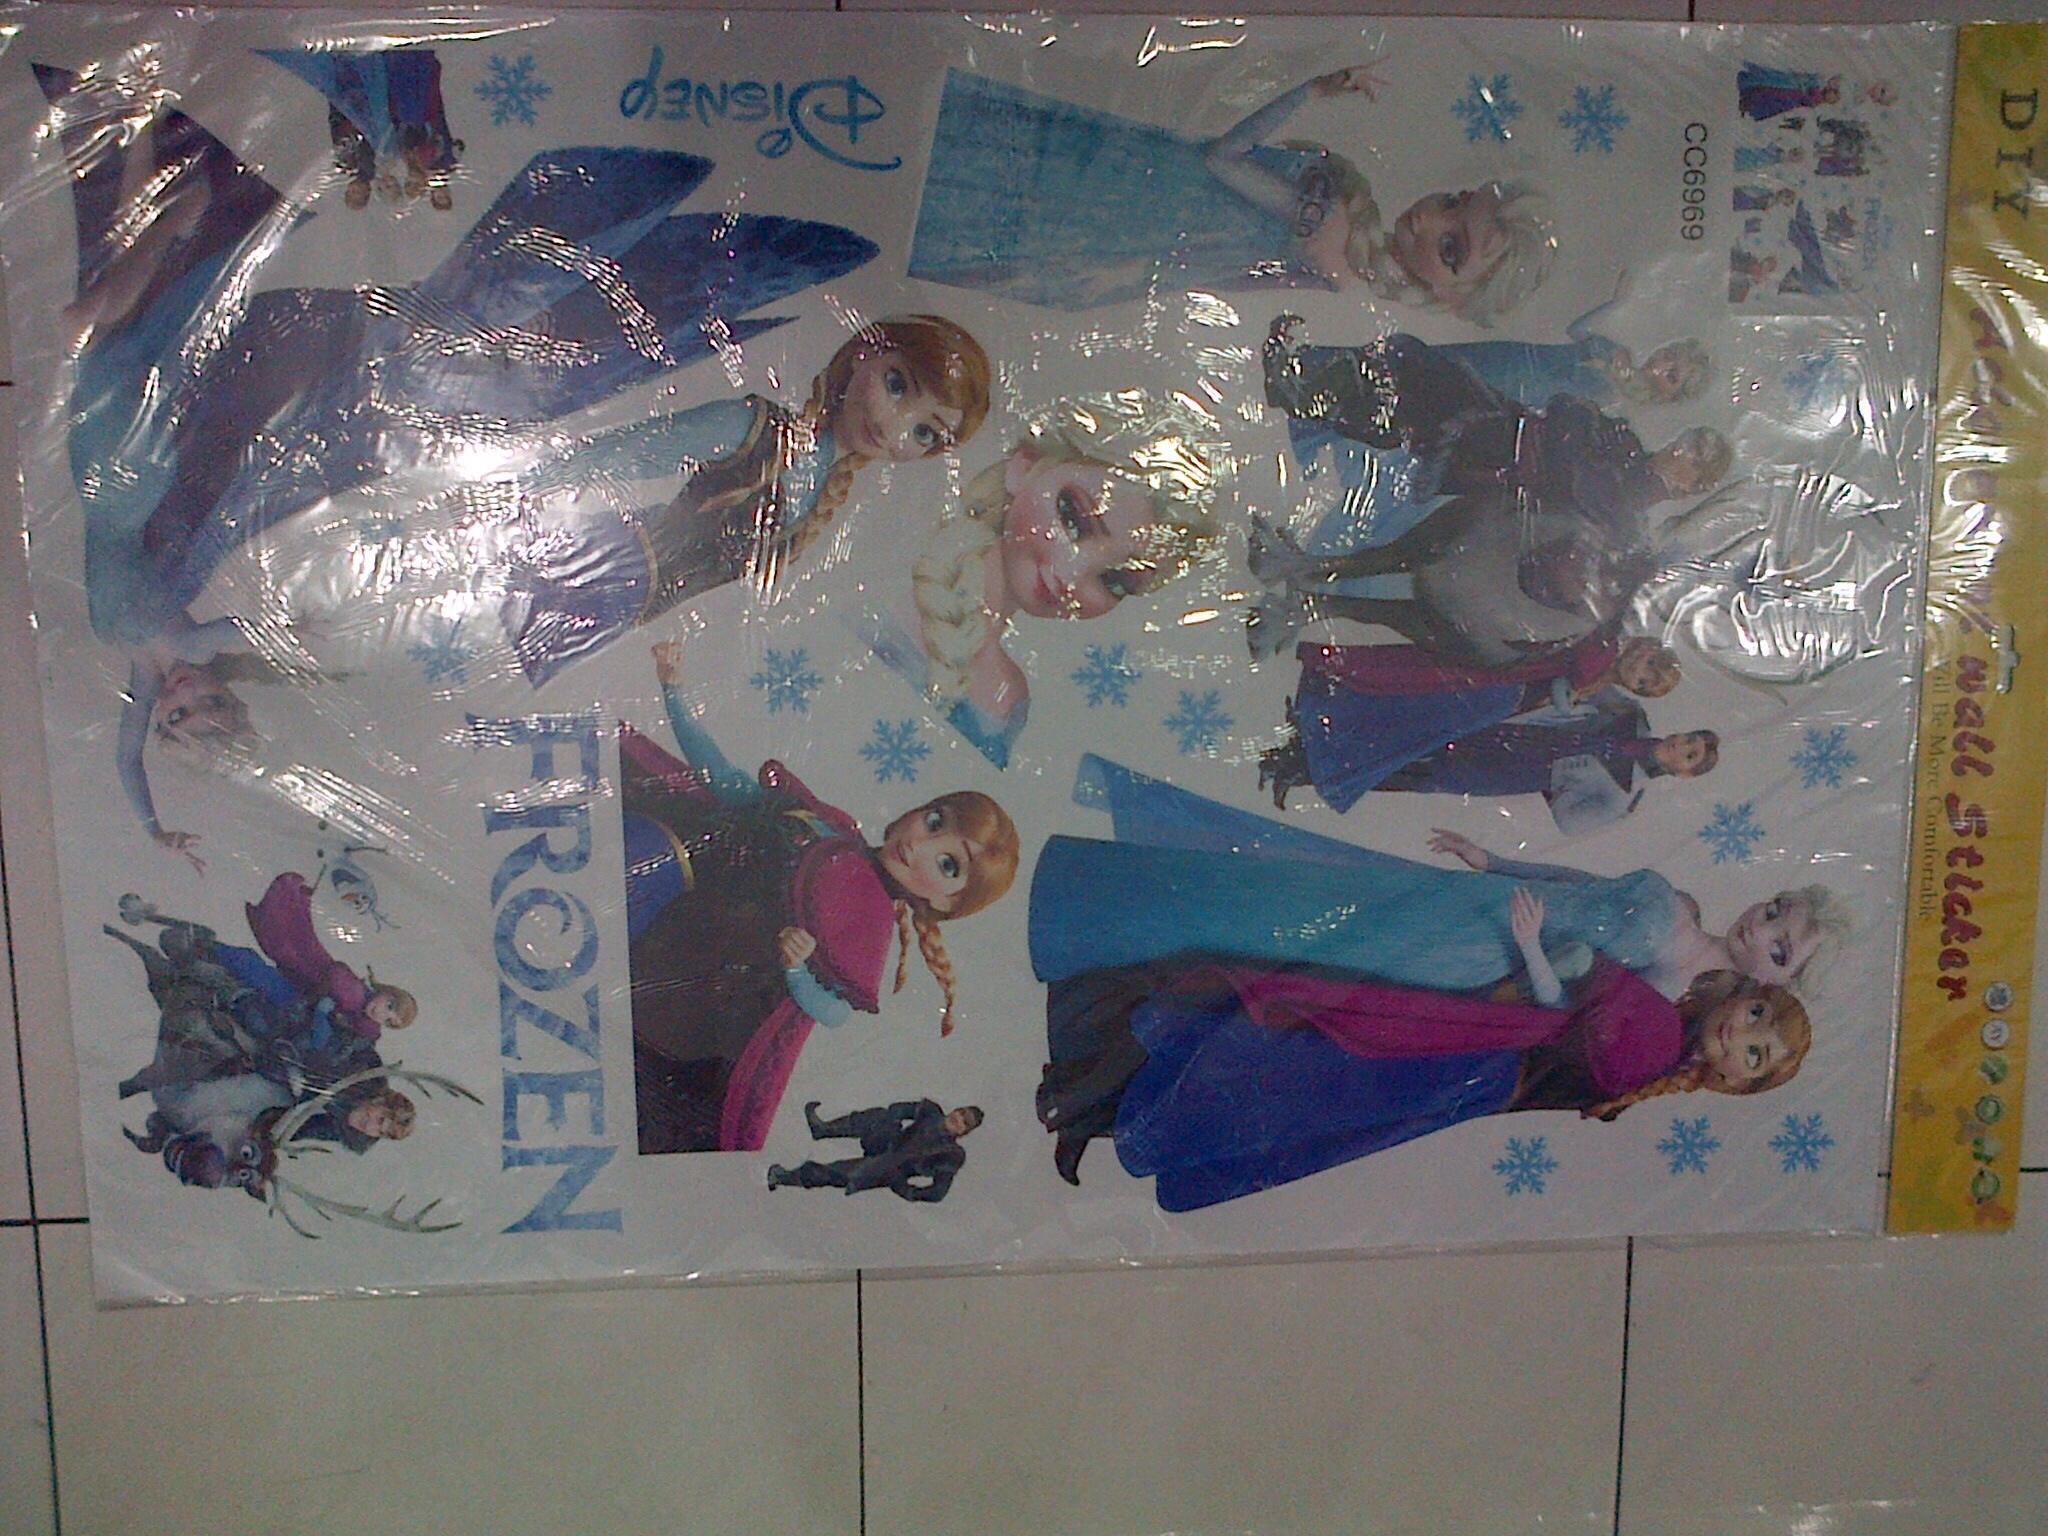 Harga Jual Wallsticker Sticker Dinding Frozen Murah Di Kab Bogor